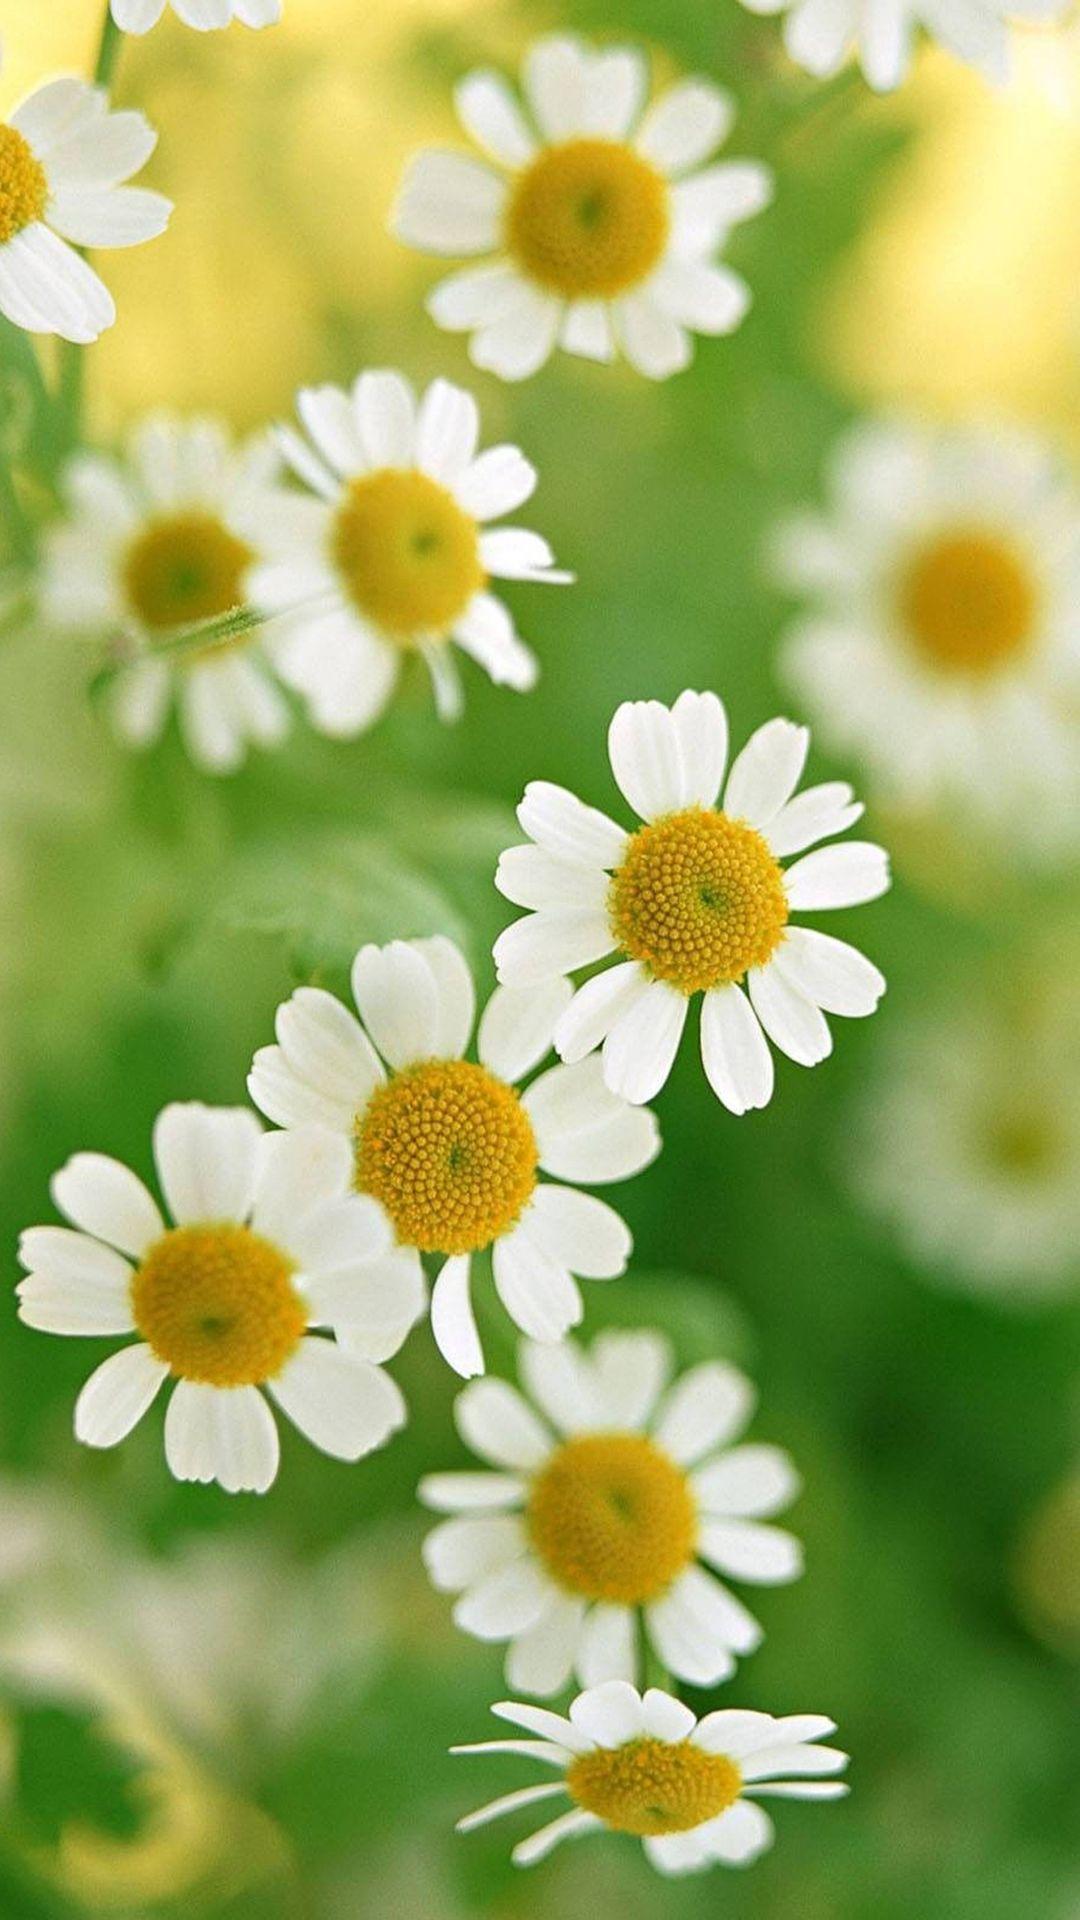 Nature White Daisy Flower iPhone 7 wallpaper iPhone 7